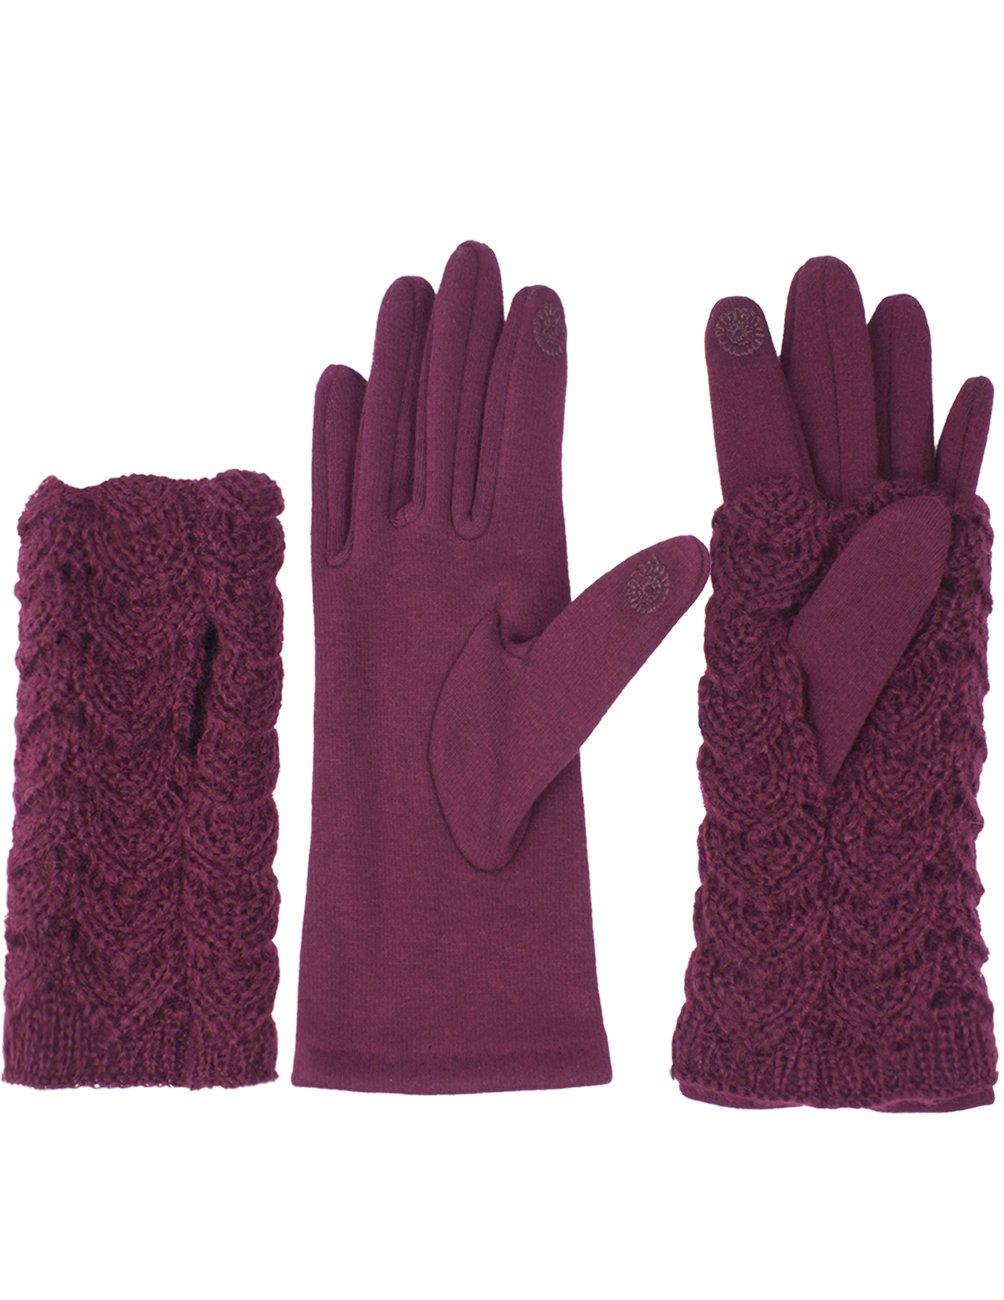 Dahlia Women's Lined Touchscreen Gloves - 2 in 1 Hand Warmer Gloves - Burgundy